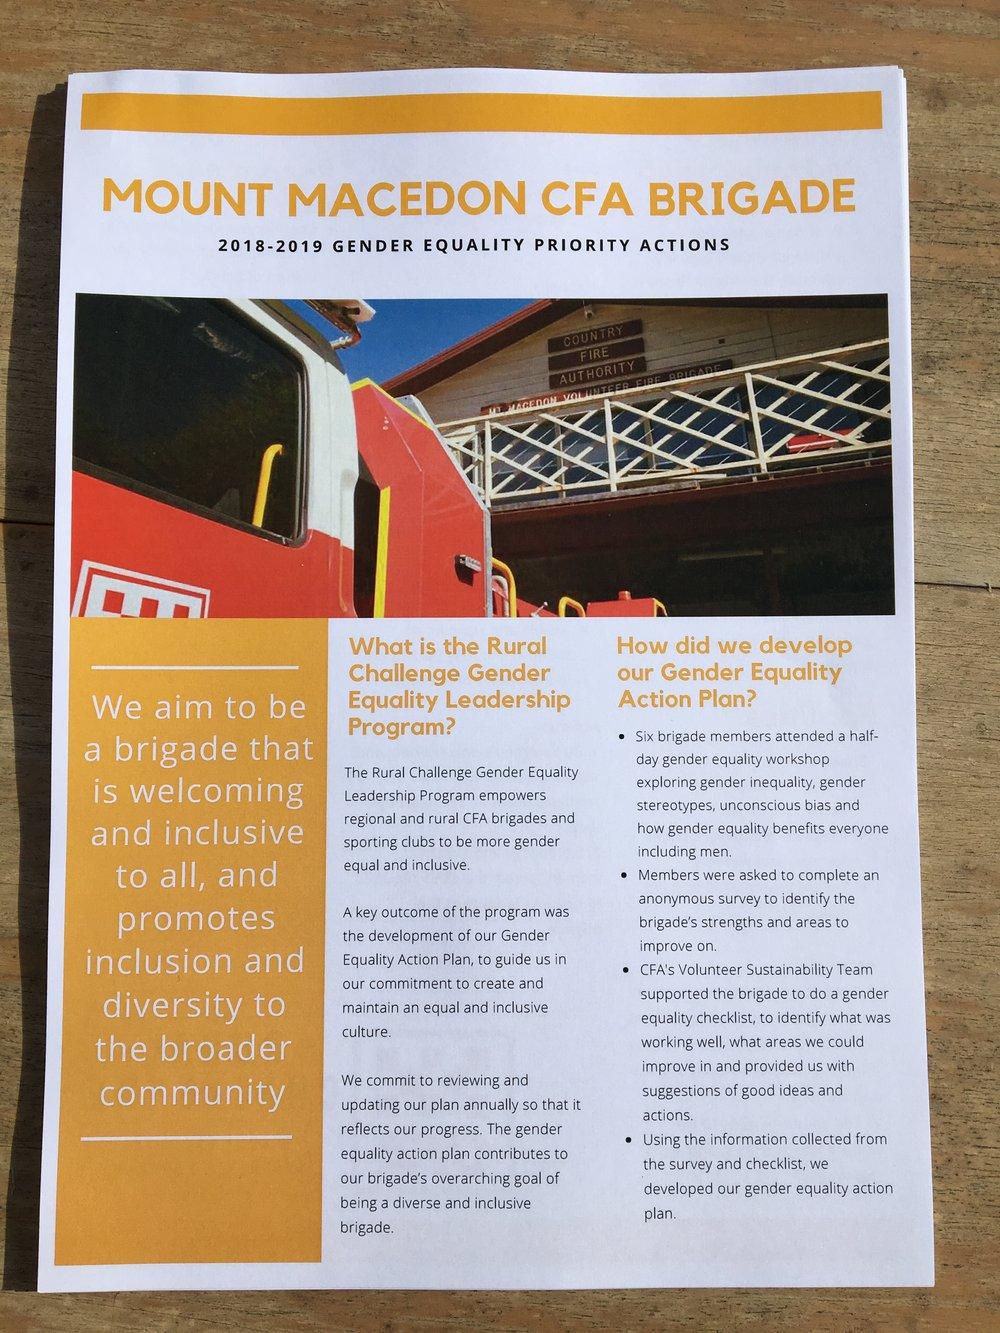 Mount Macedon CFA Brigade's 2018-2019 Gender Equality Action Plan Goal